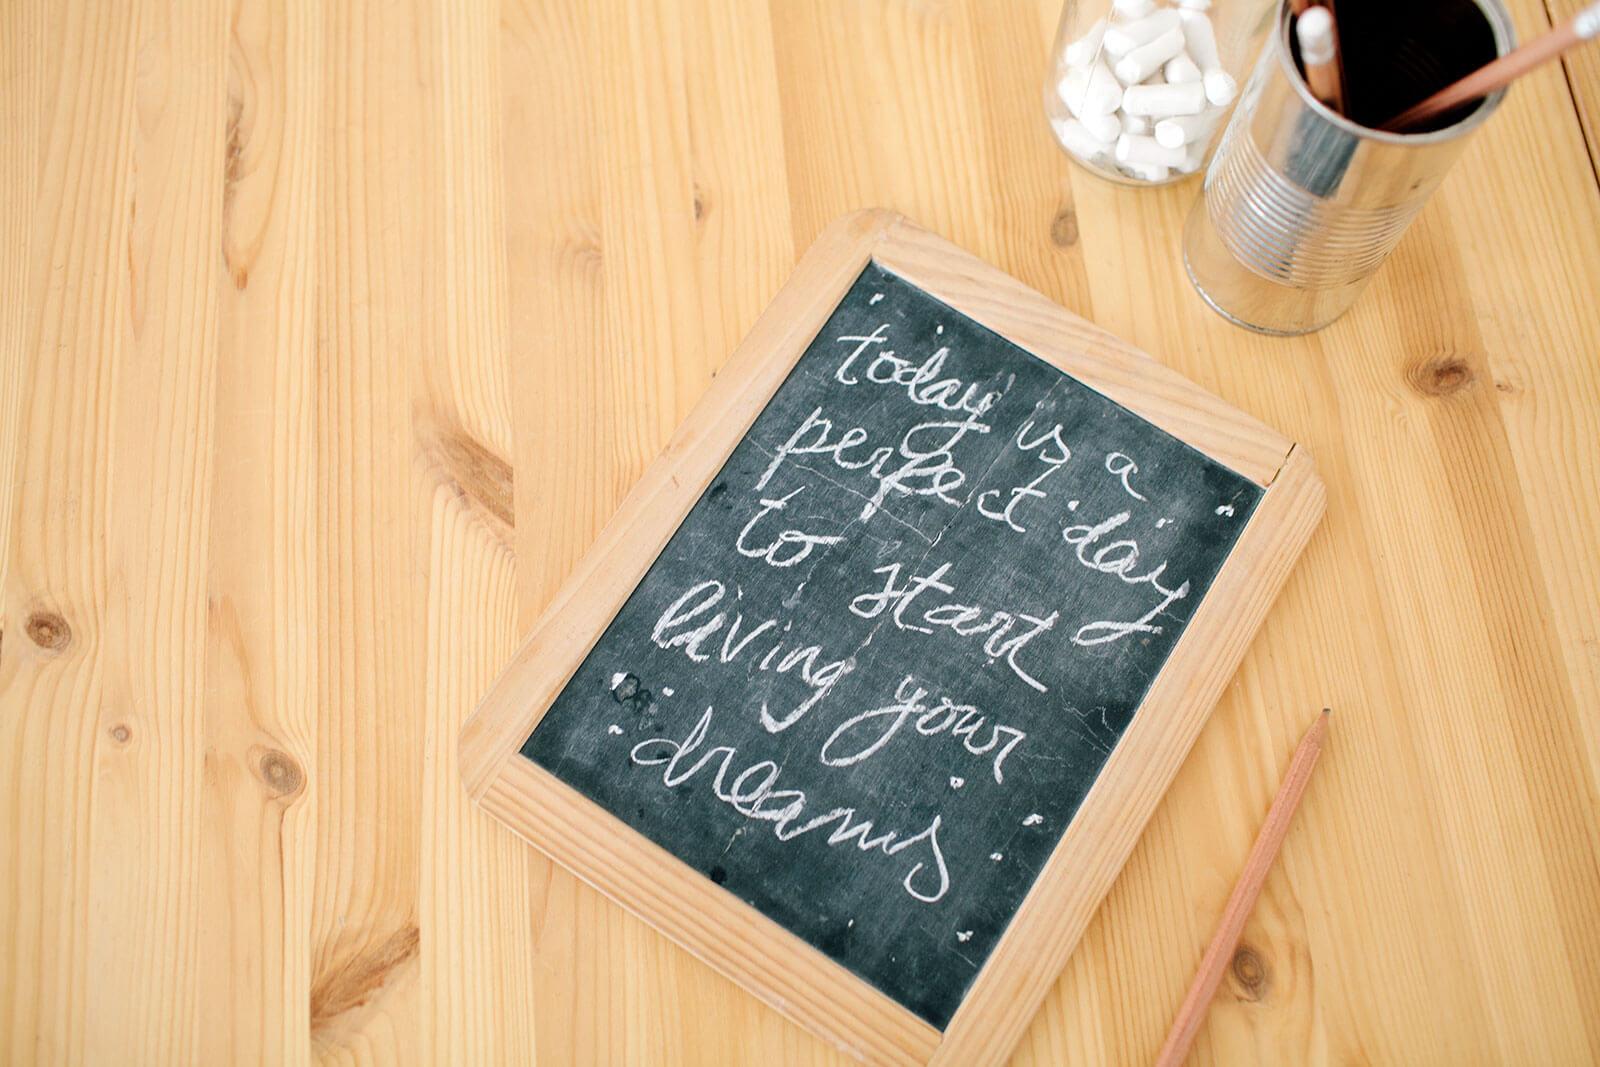 halkboard, written with chalk, on a wooden table.